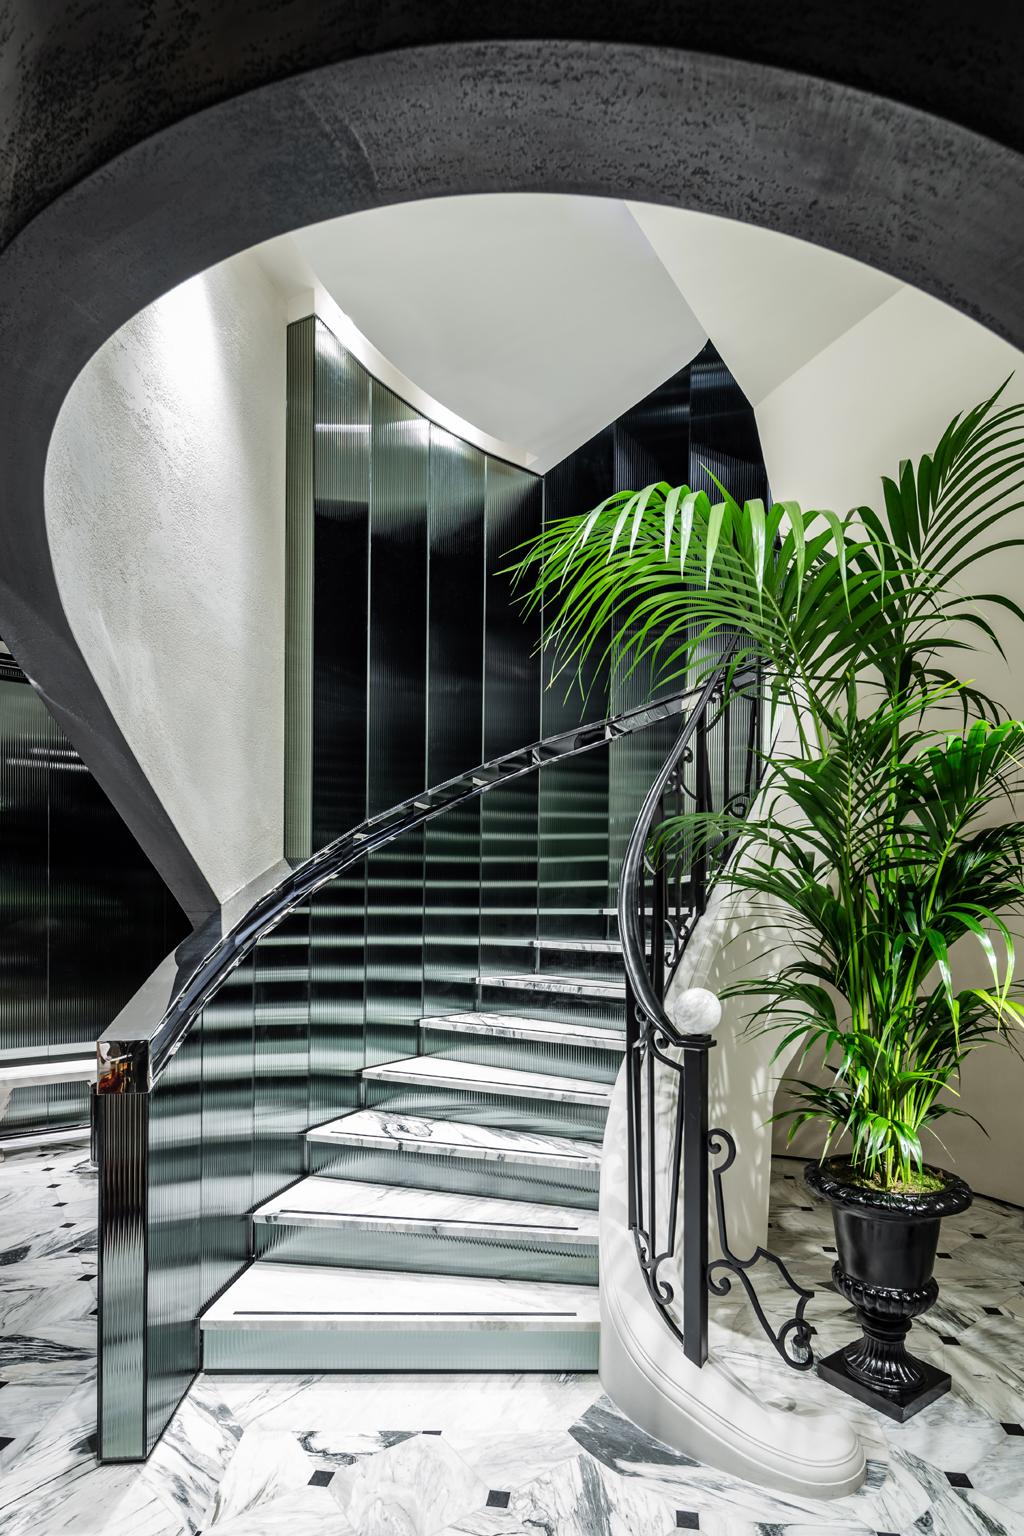 Staircase at Balmain Flagship Store Saint Honoré, Paris - Designed by Studio AMV